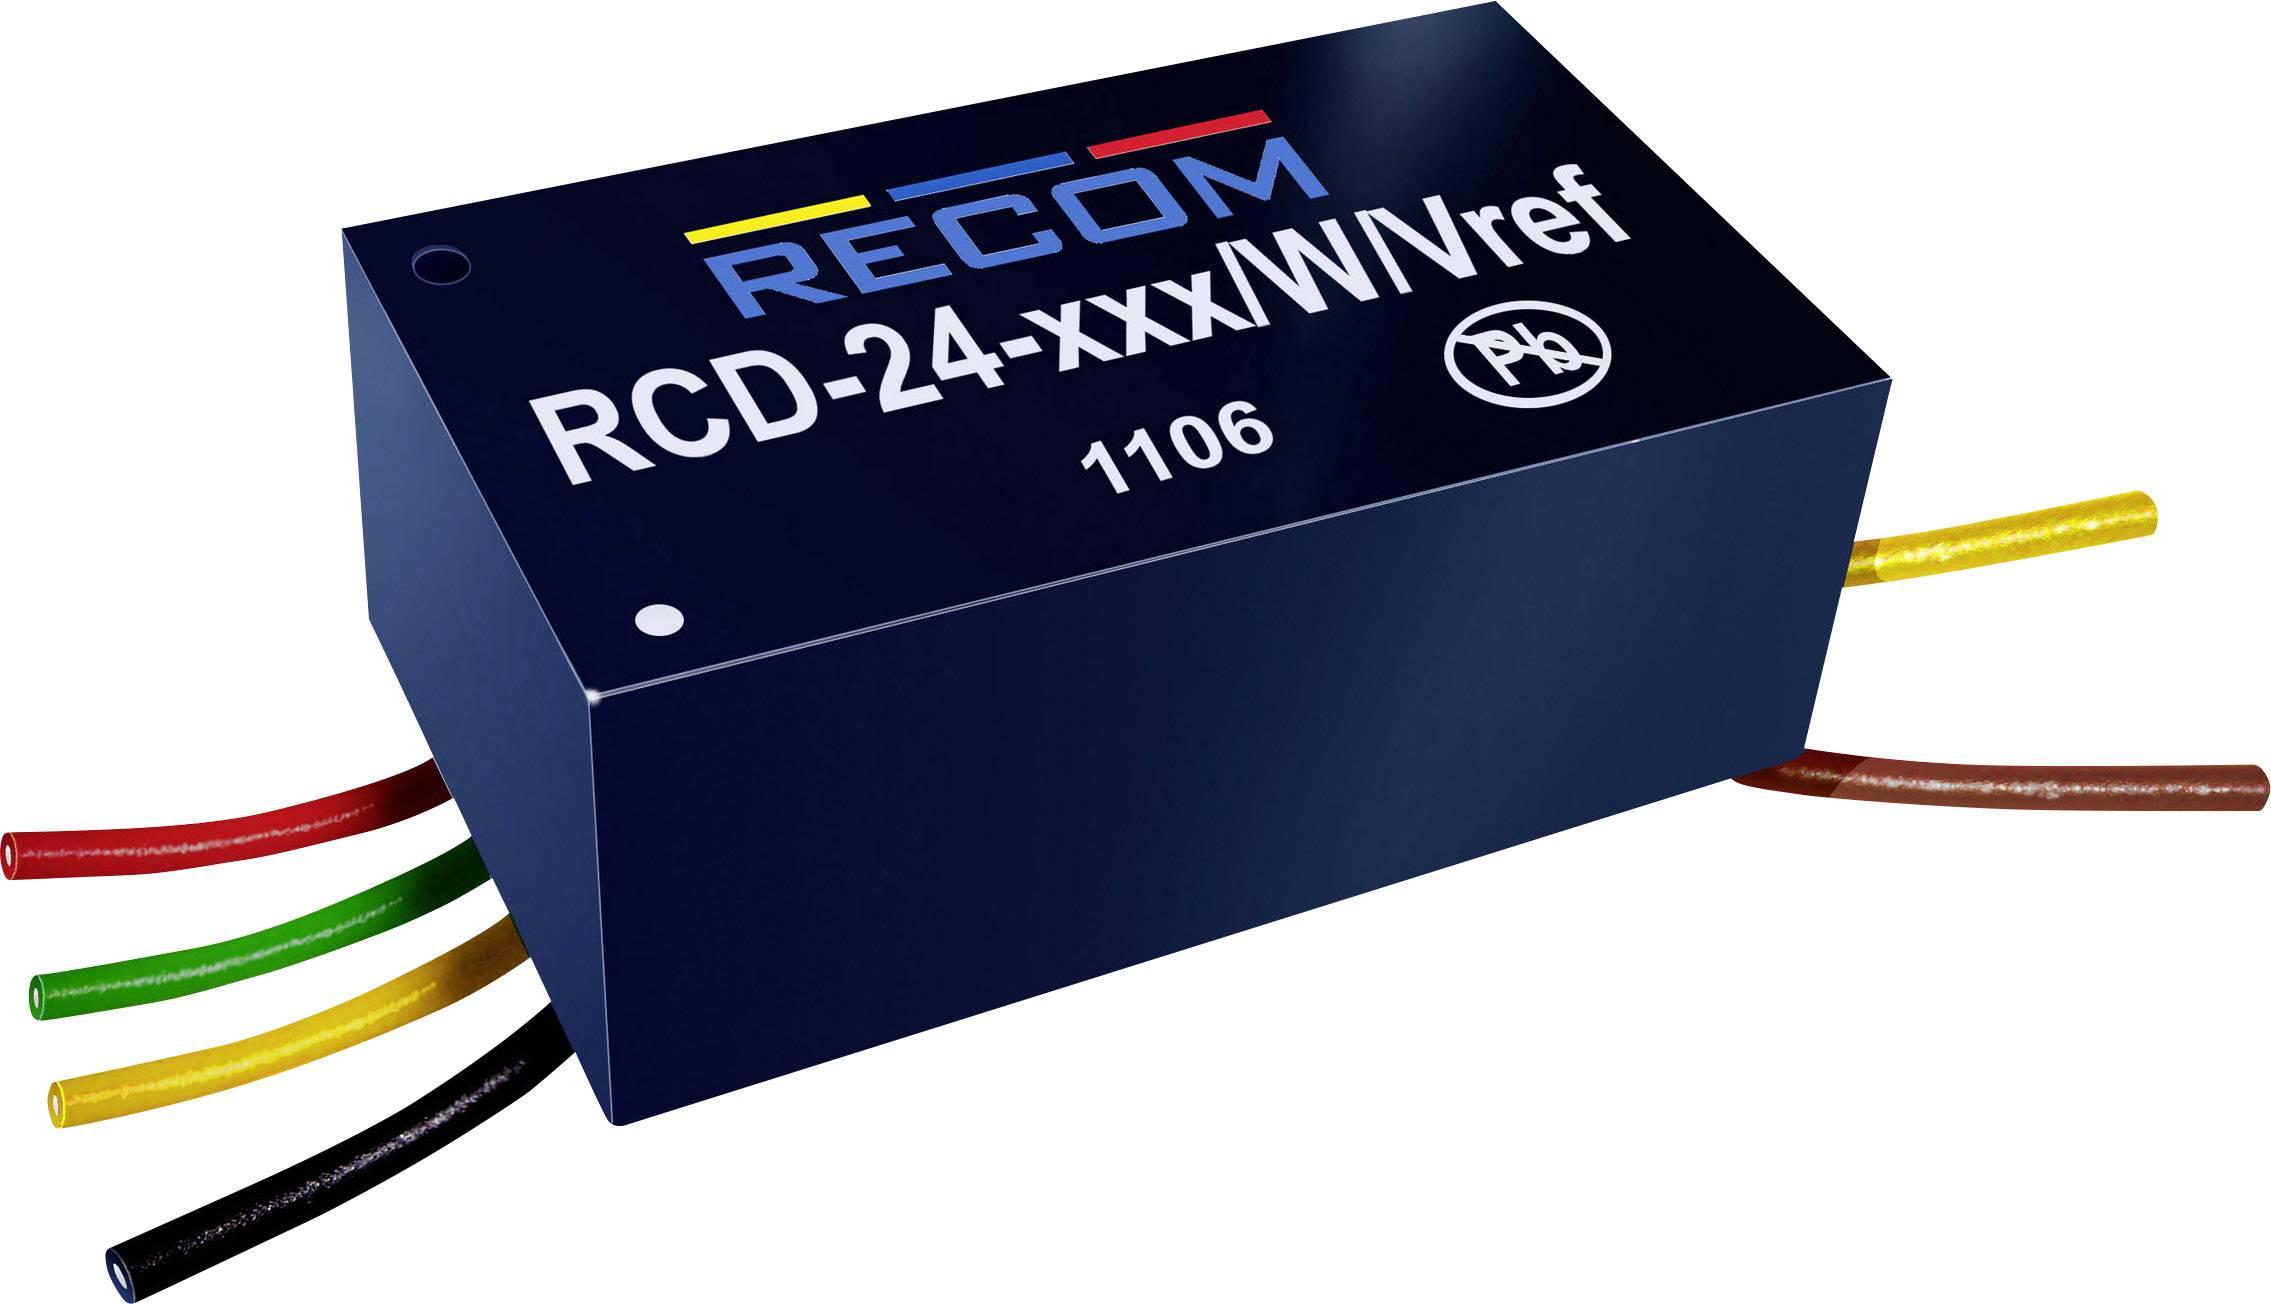 LED driver Recom Lighting, RCD-24-0.35/W, 36 V/DC, 350 mA